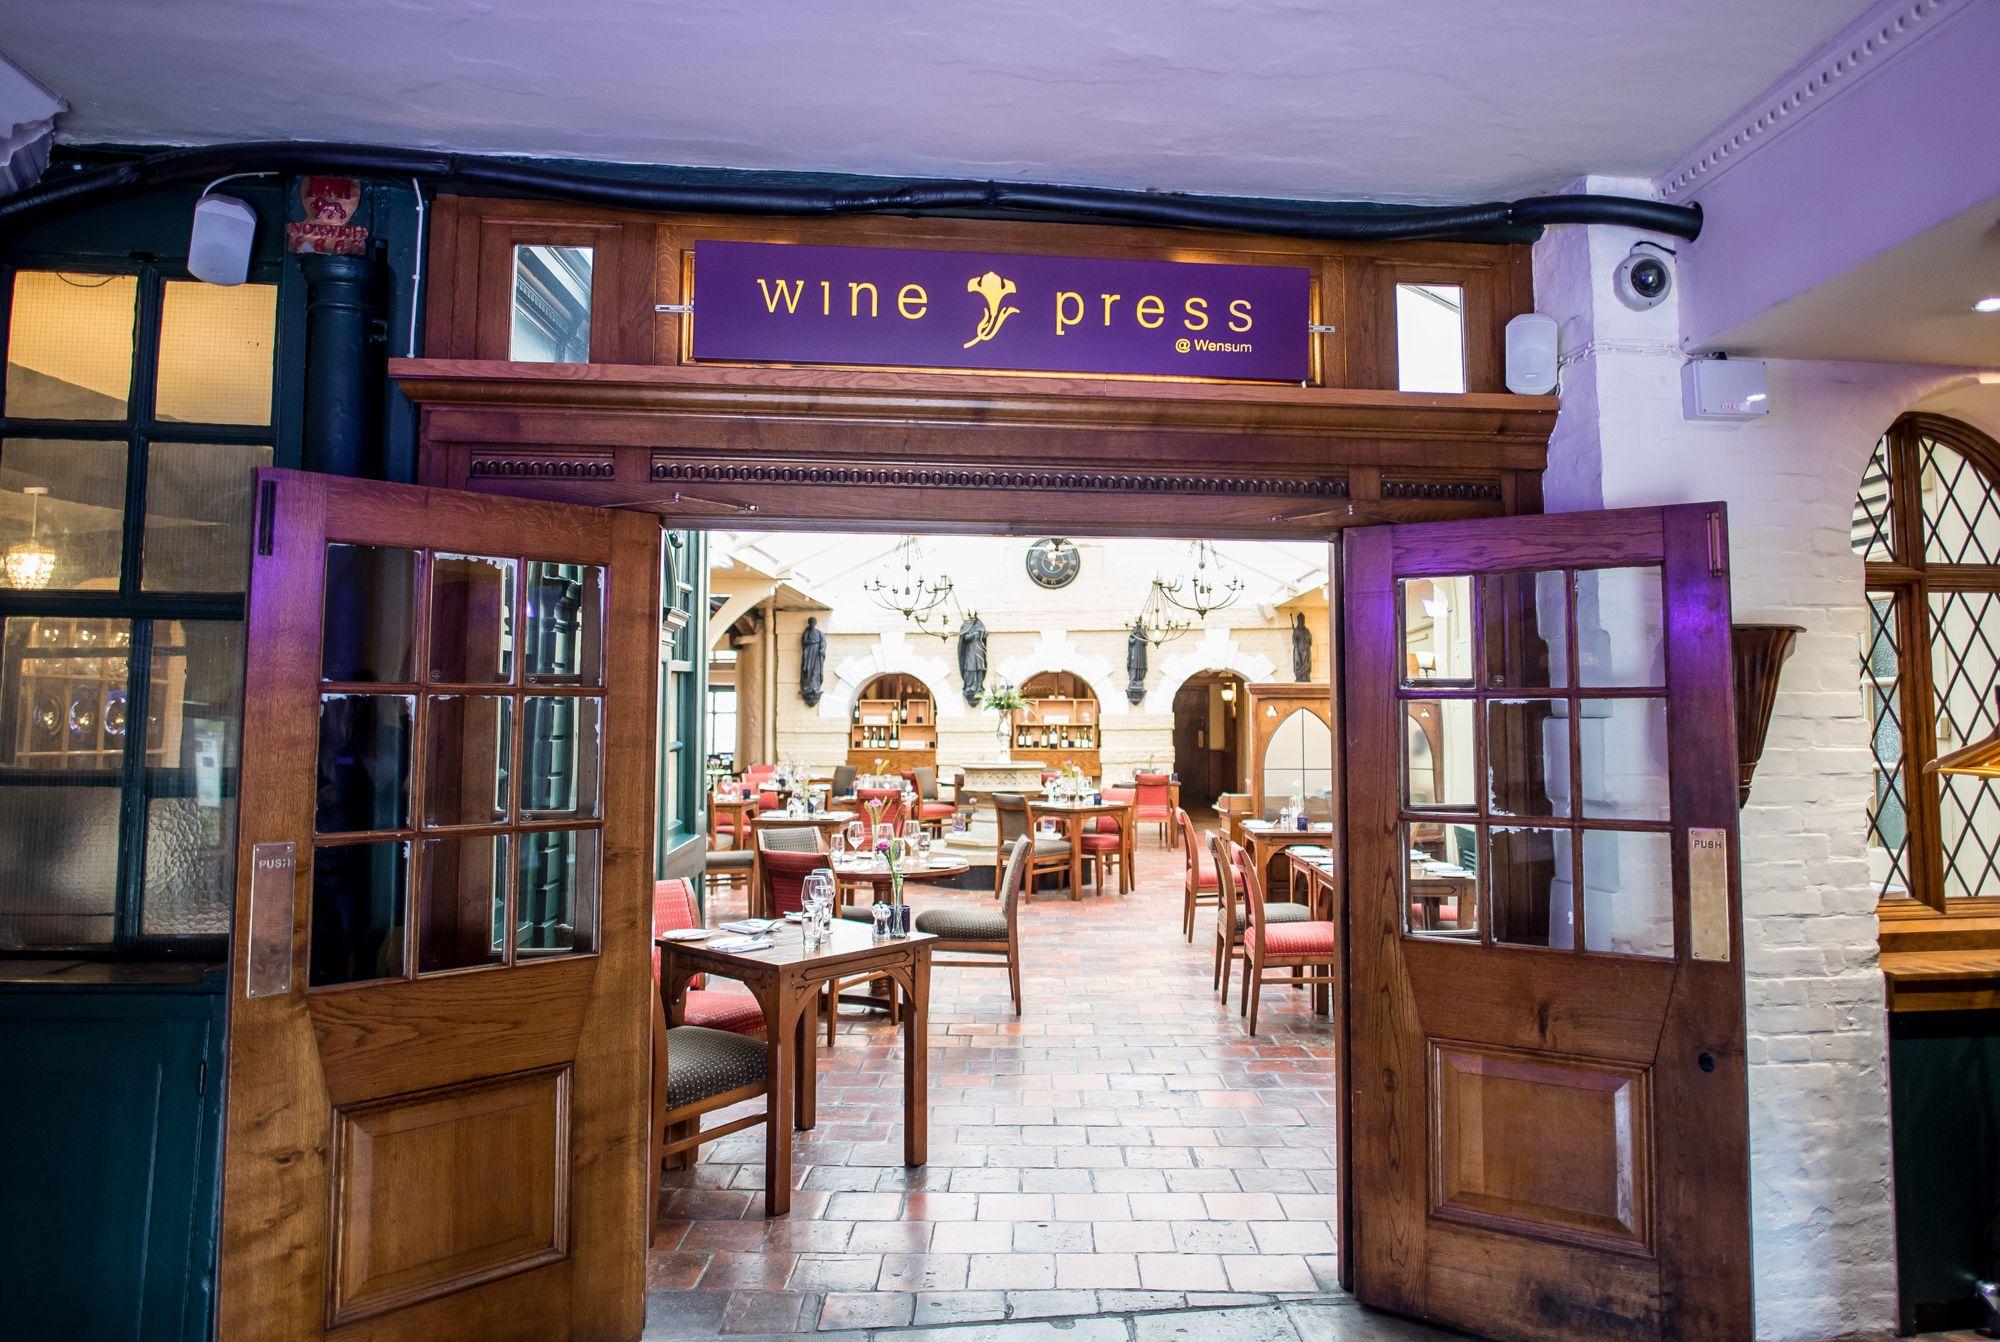 The Wine Press @Wensum